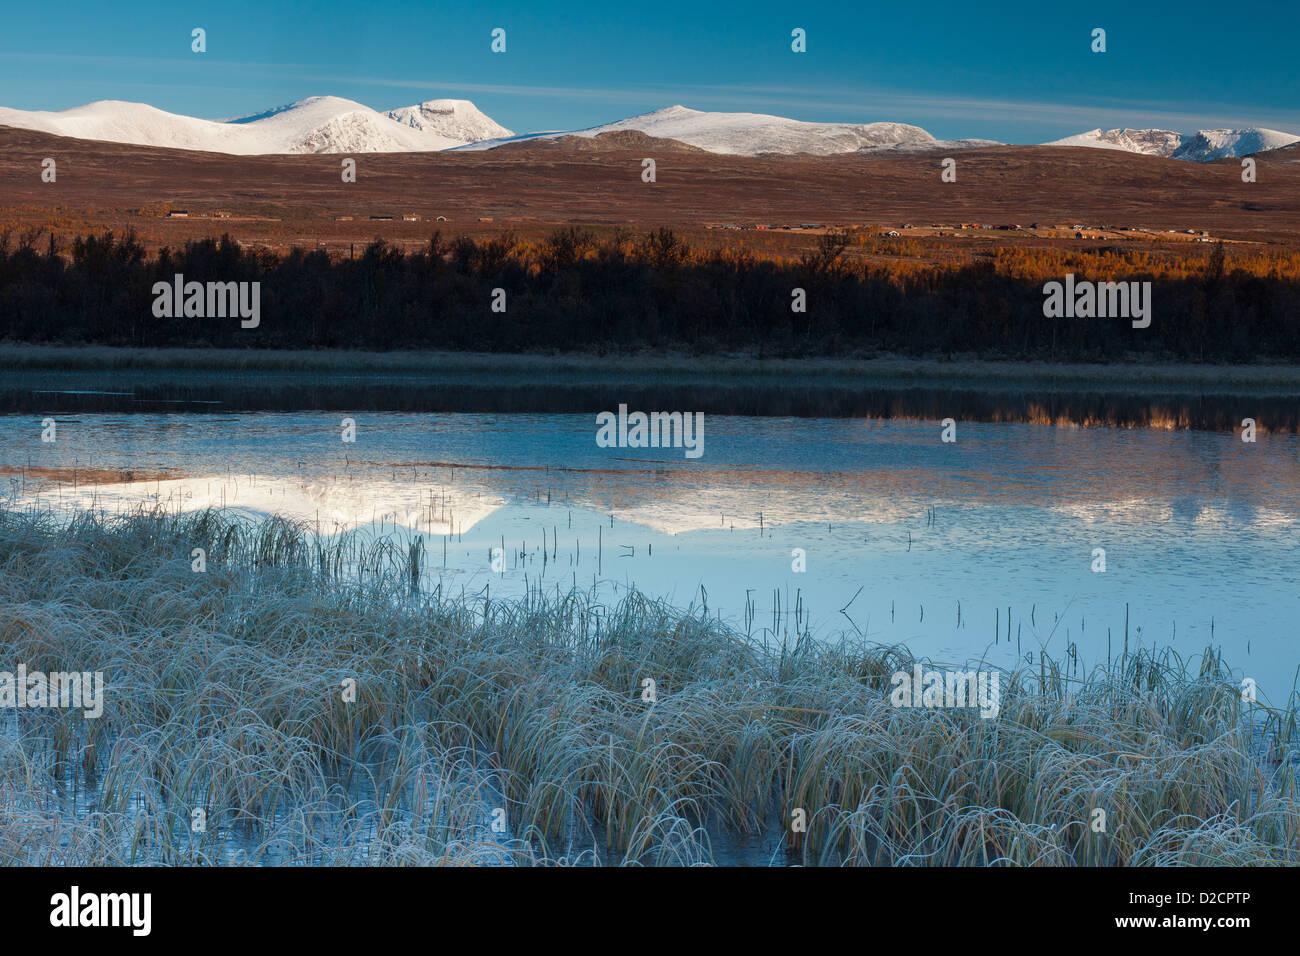 Frosty settembre mattina a Fokstumyra riserva naturale, Dovre, Norvegia. Immagini Stock